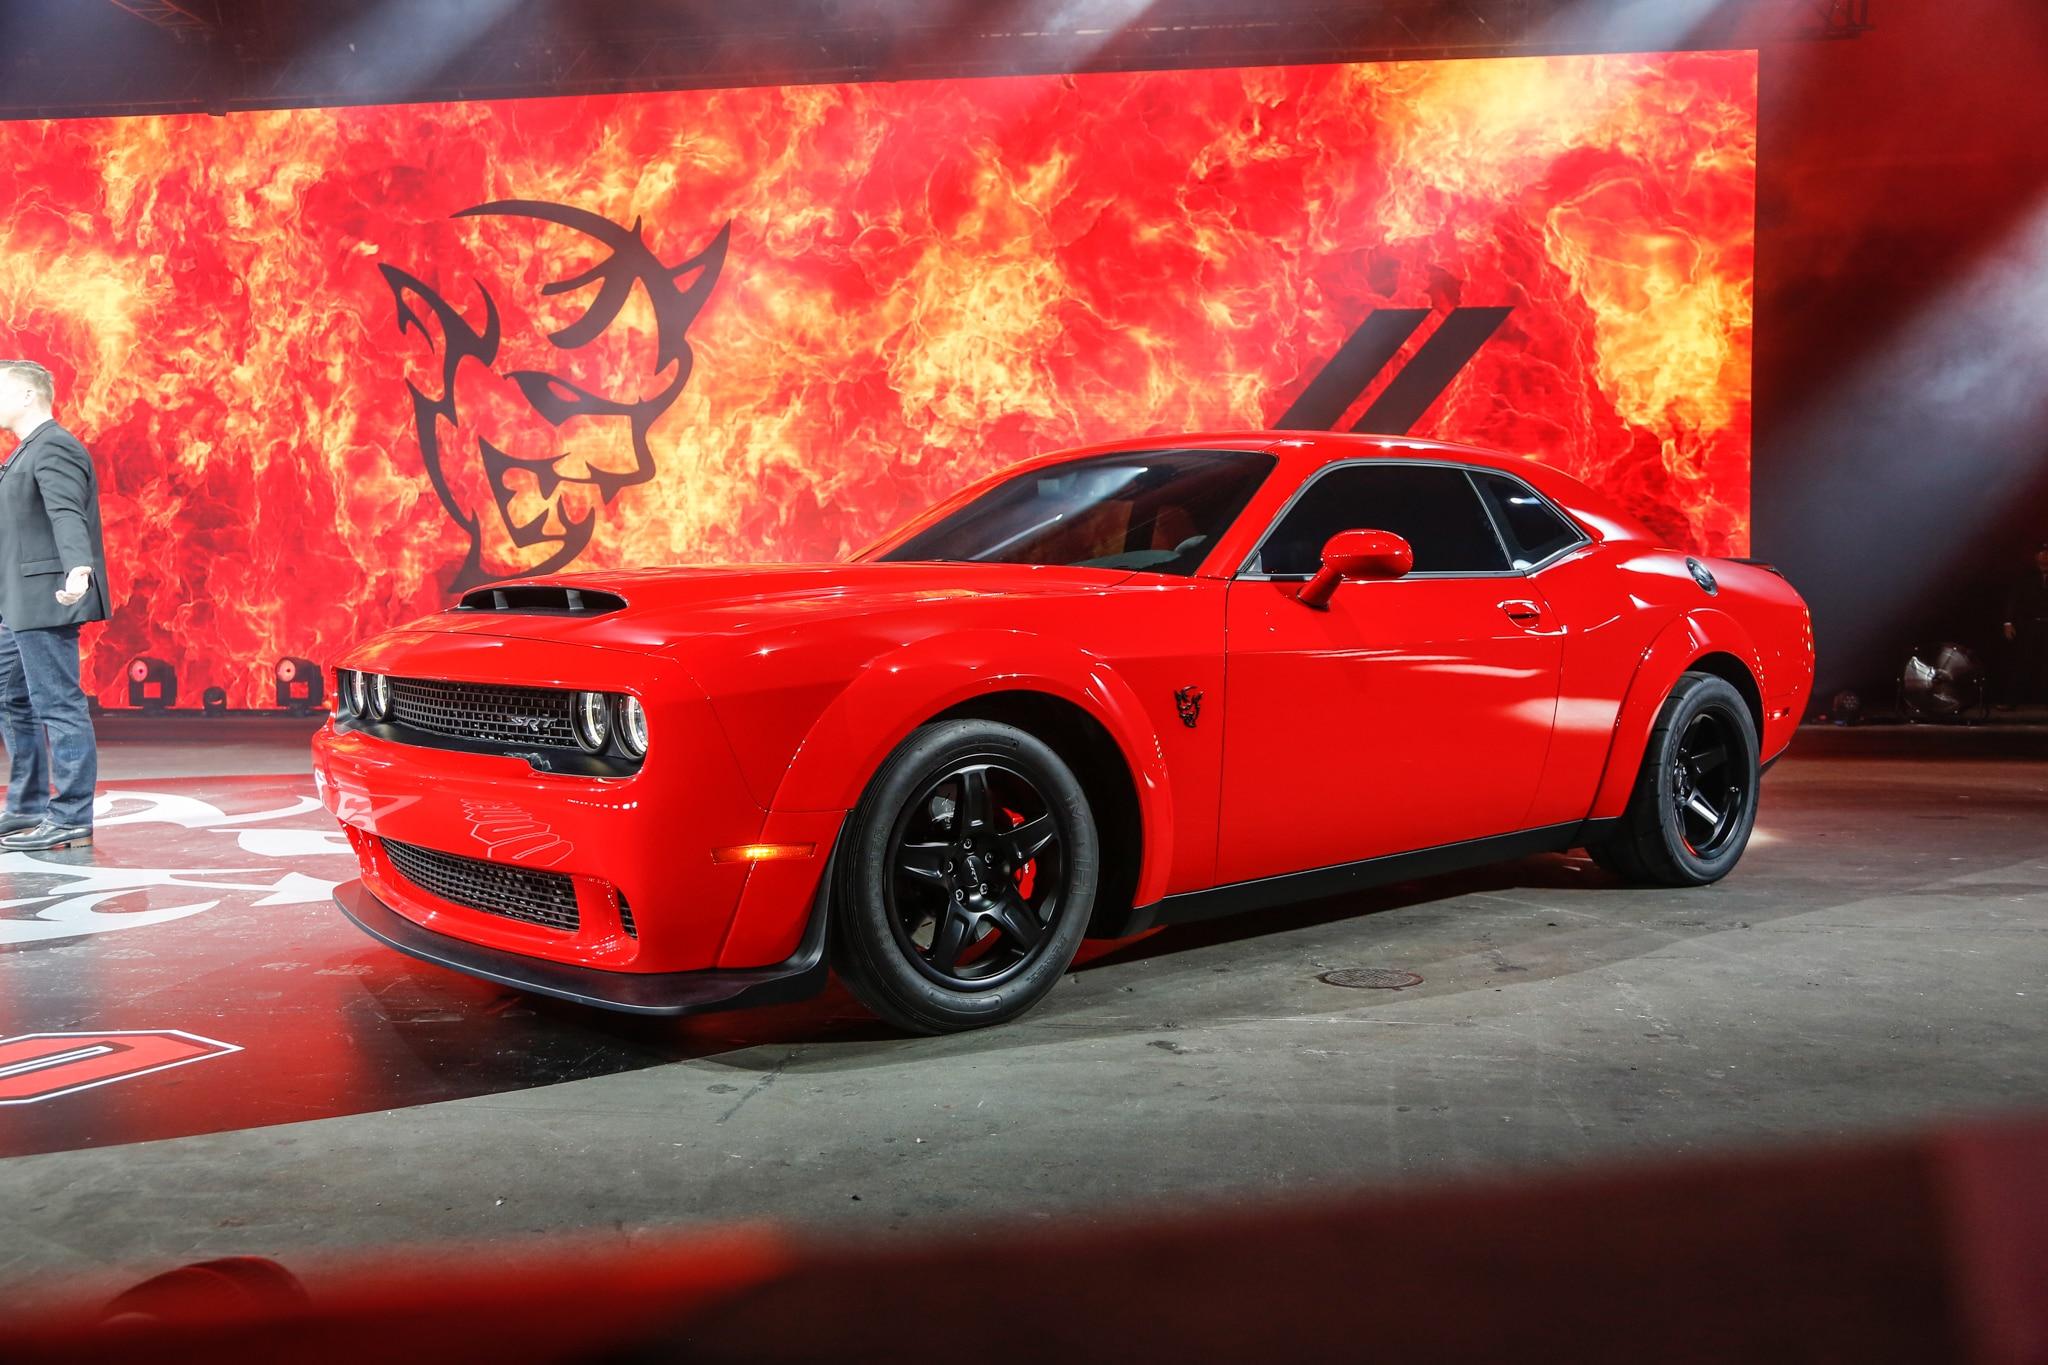 Dodge Challenger Srt Demon 2018 >> 2017 New York Auto Show Hits, Misses, and Revelations | Automobile Magazine